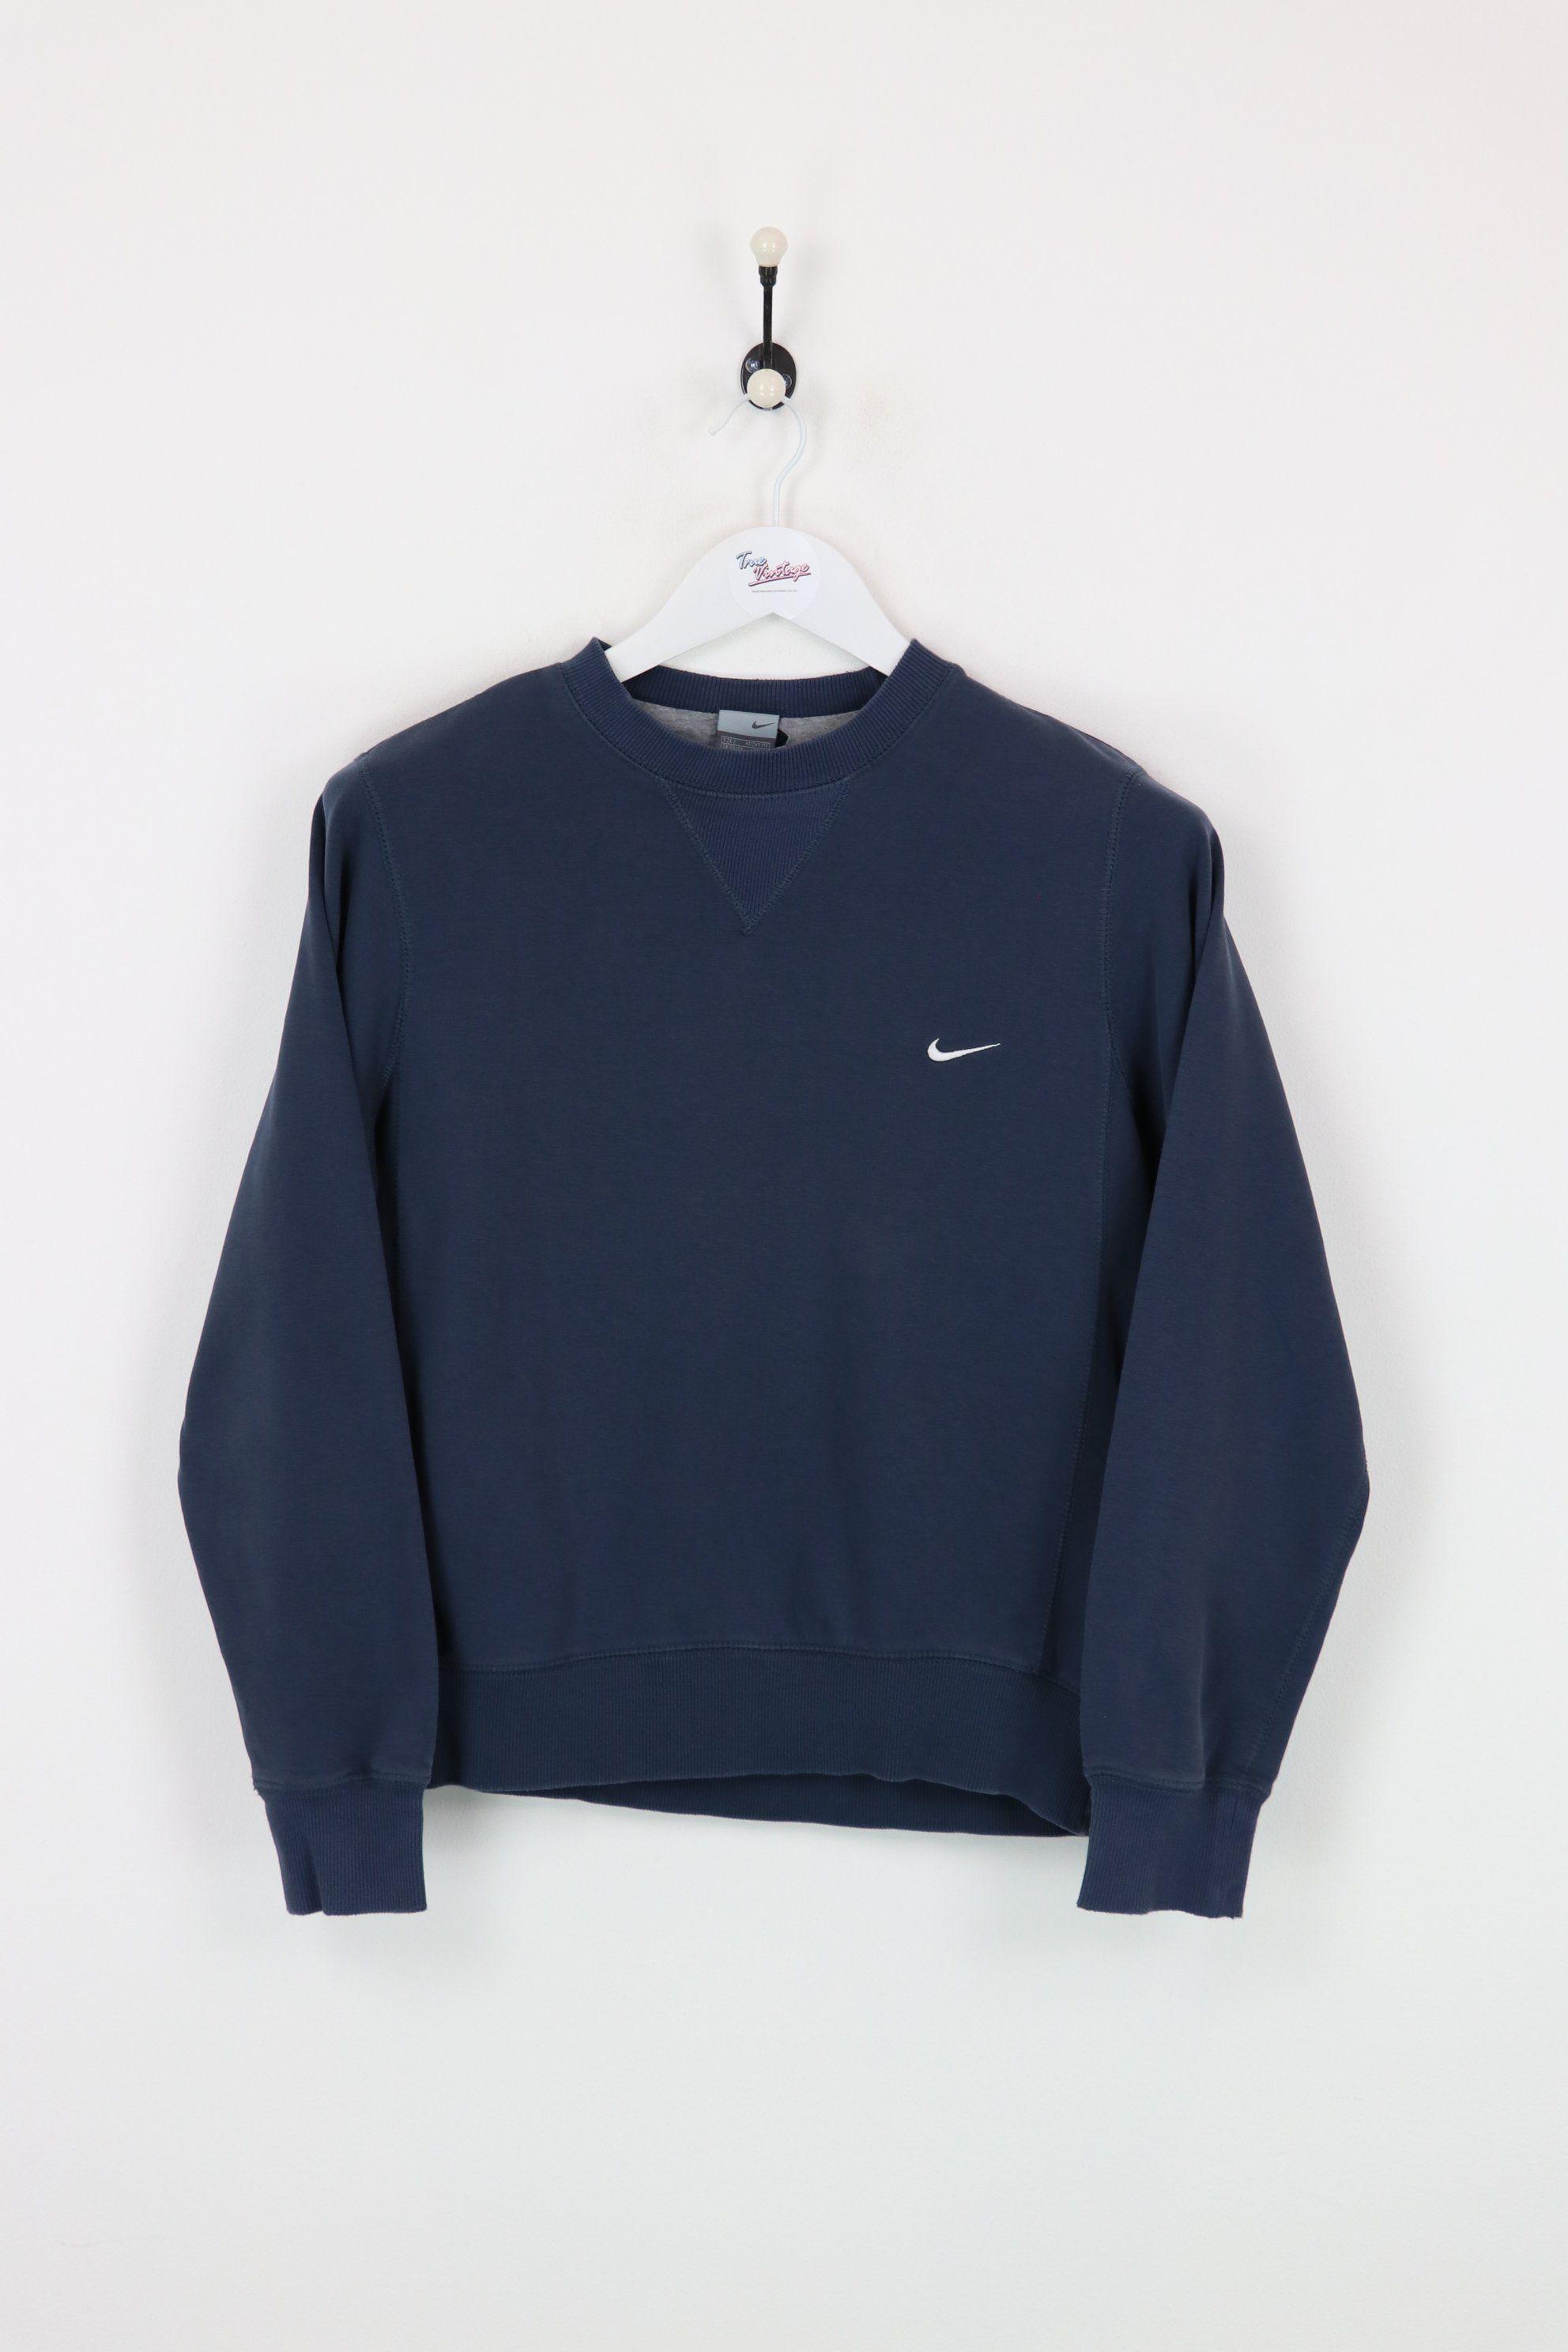 Nike Sweatshirt Navy Xs Vendor Niketype Sweatshirts Hoodsprice 32 00 Very Good Condition Vintage Nikesw Nike Sweatshirts Cute Casual Outfits Sweatshirts